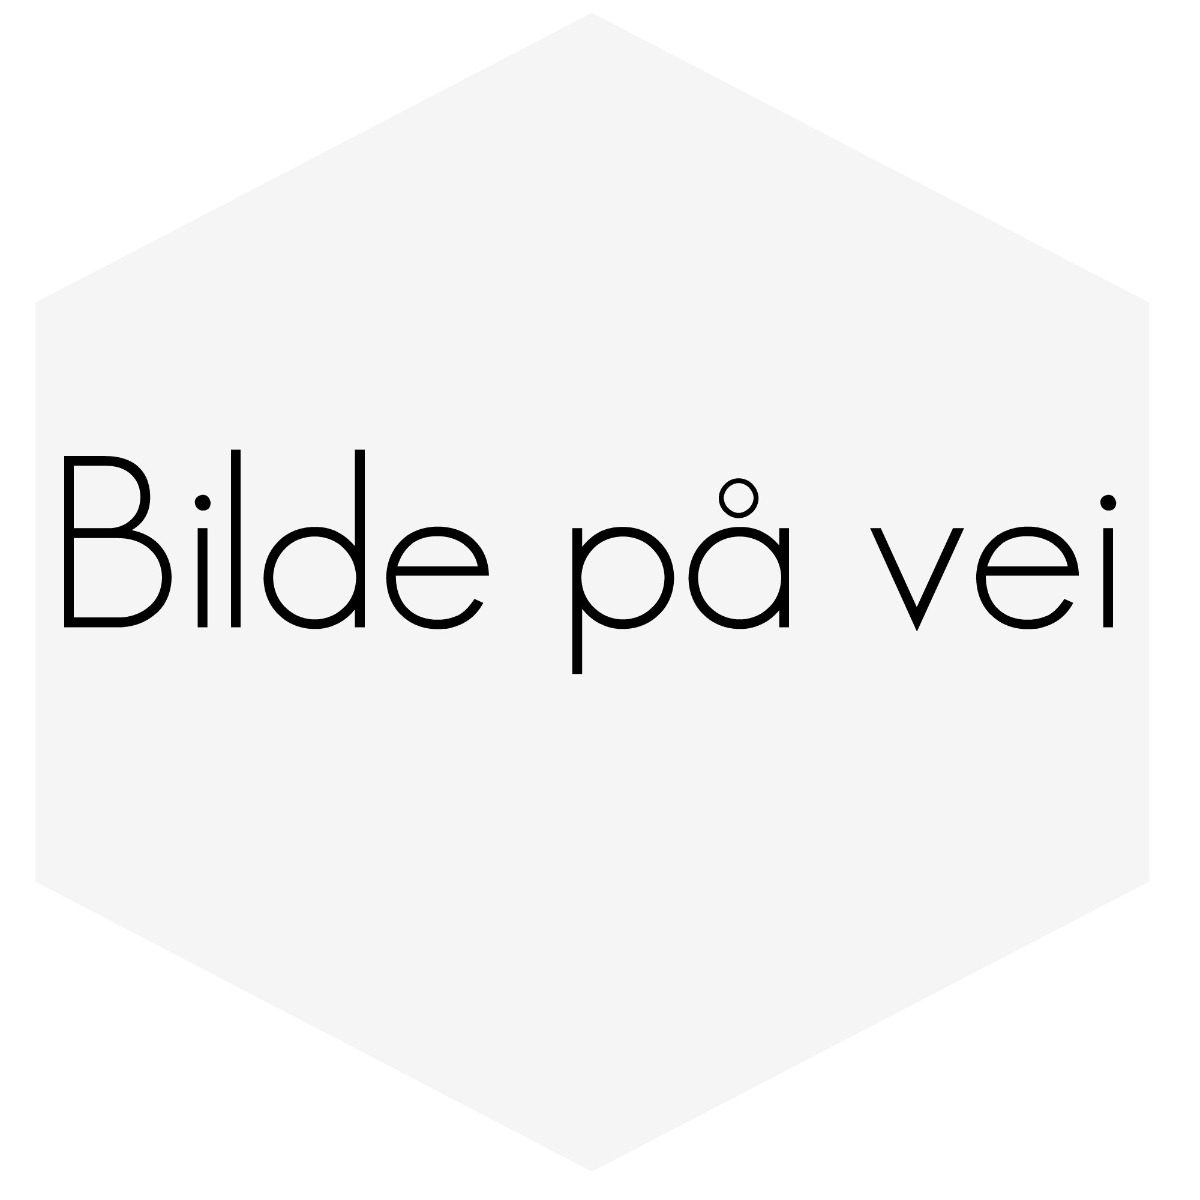 BLINK/PARKGLASS FORAN AMAZON  HØYRE